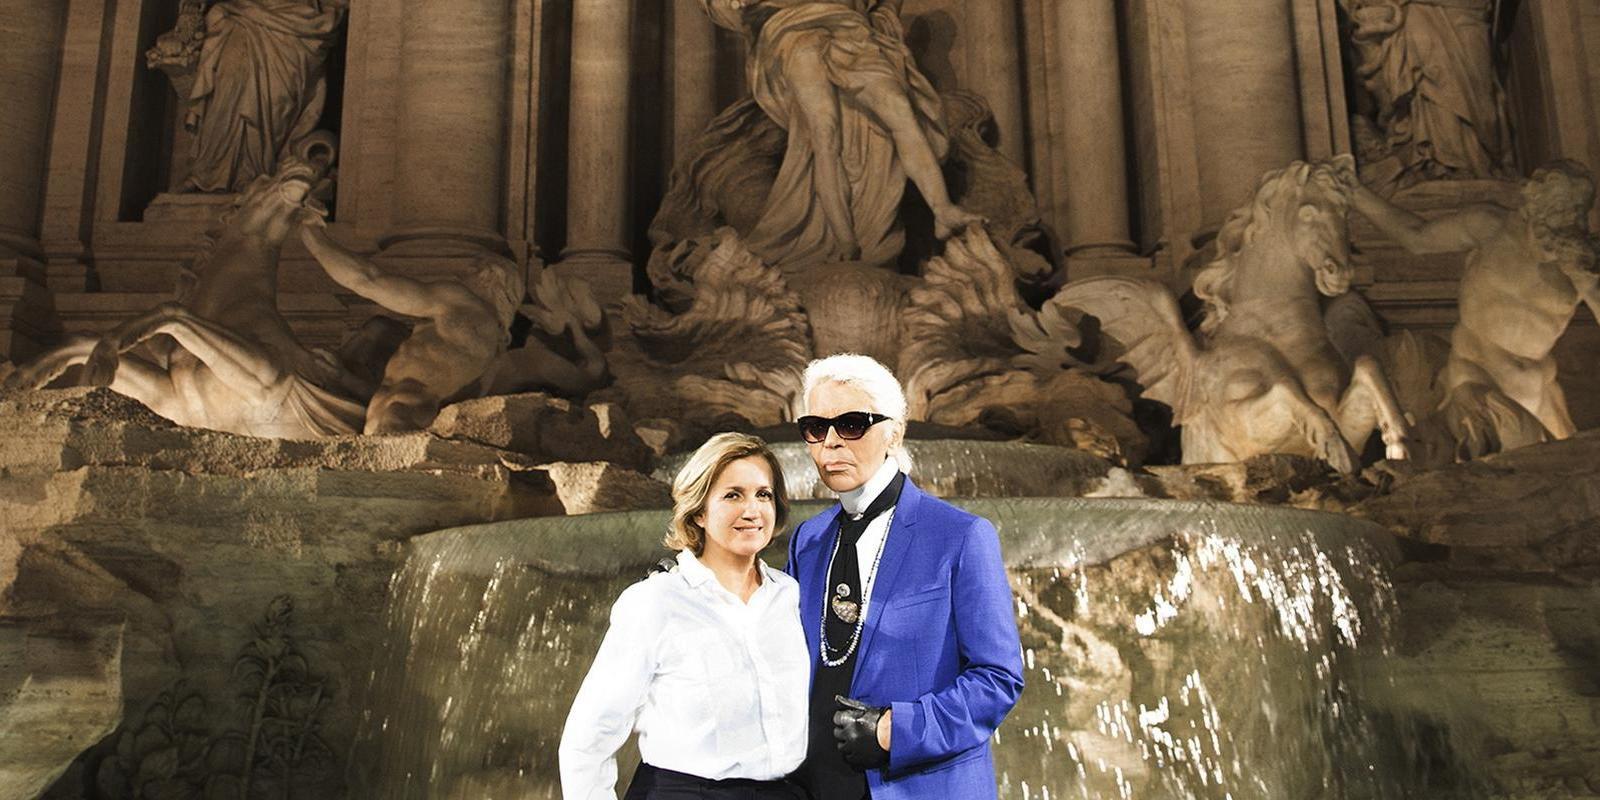 Silvia Venturini Fendi e Karl Lagerfeld em frente à Fonte de Trevi, em Roma